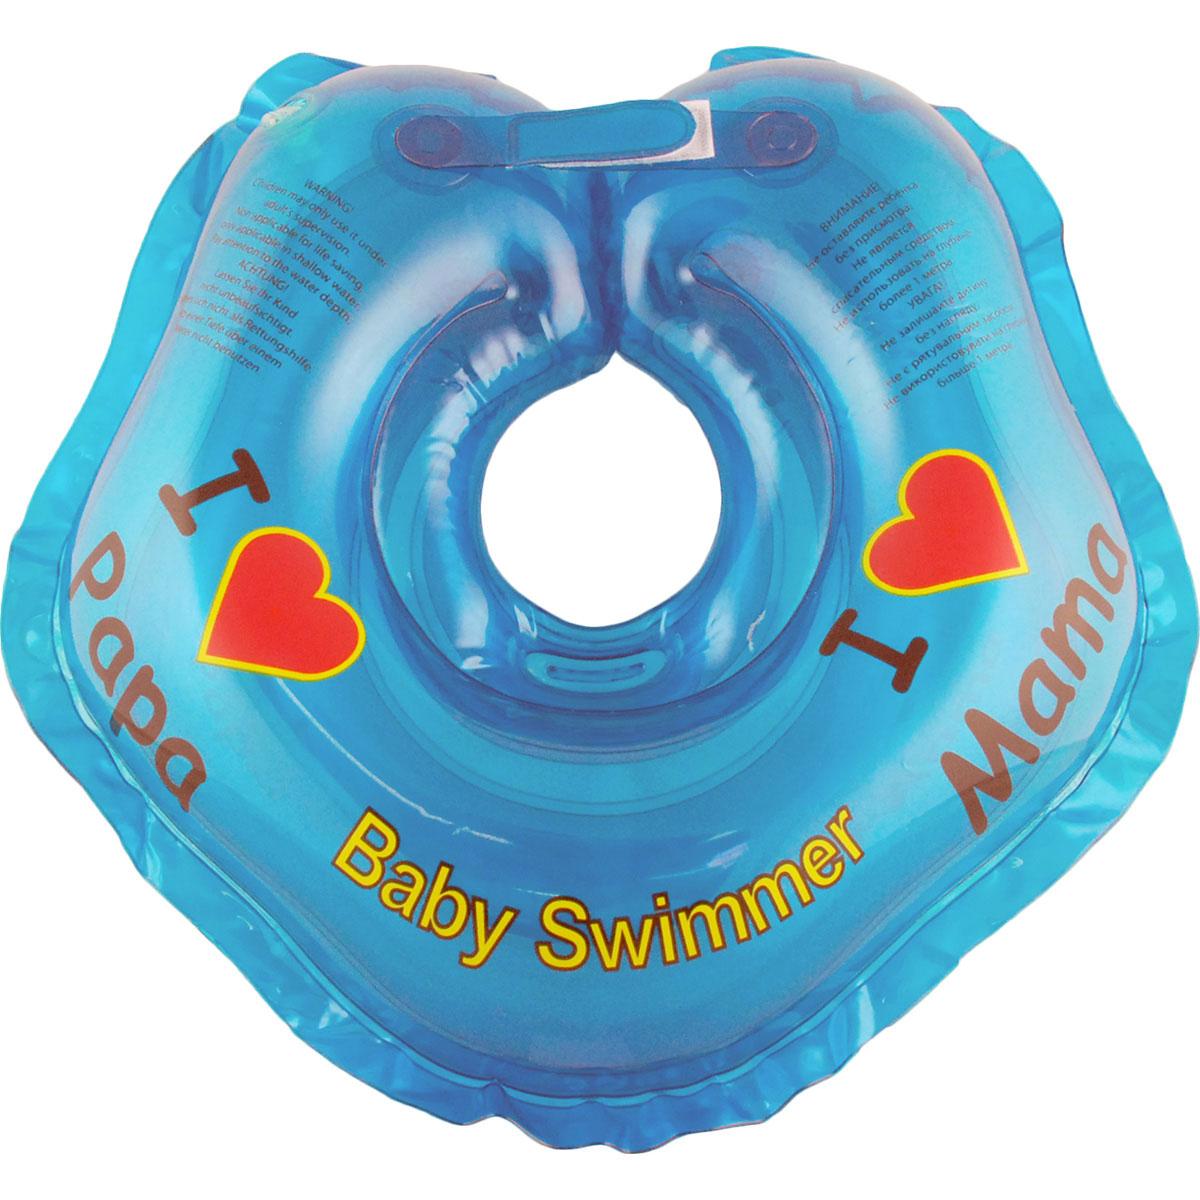 Круг на шею Baby Swimmer, цвет: голубой, 3-12 кг roxi kids fl002 круг на шею для купания малышей